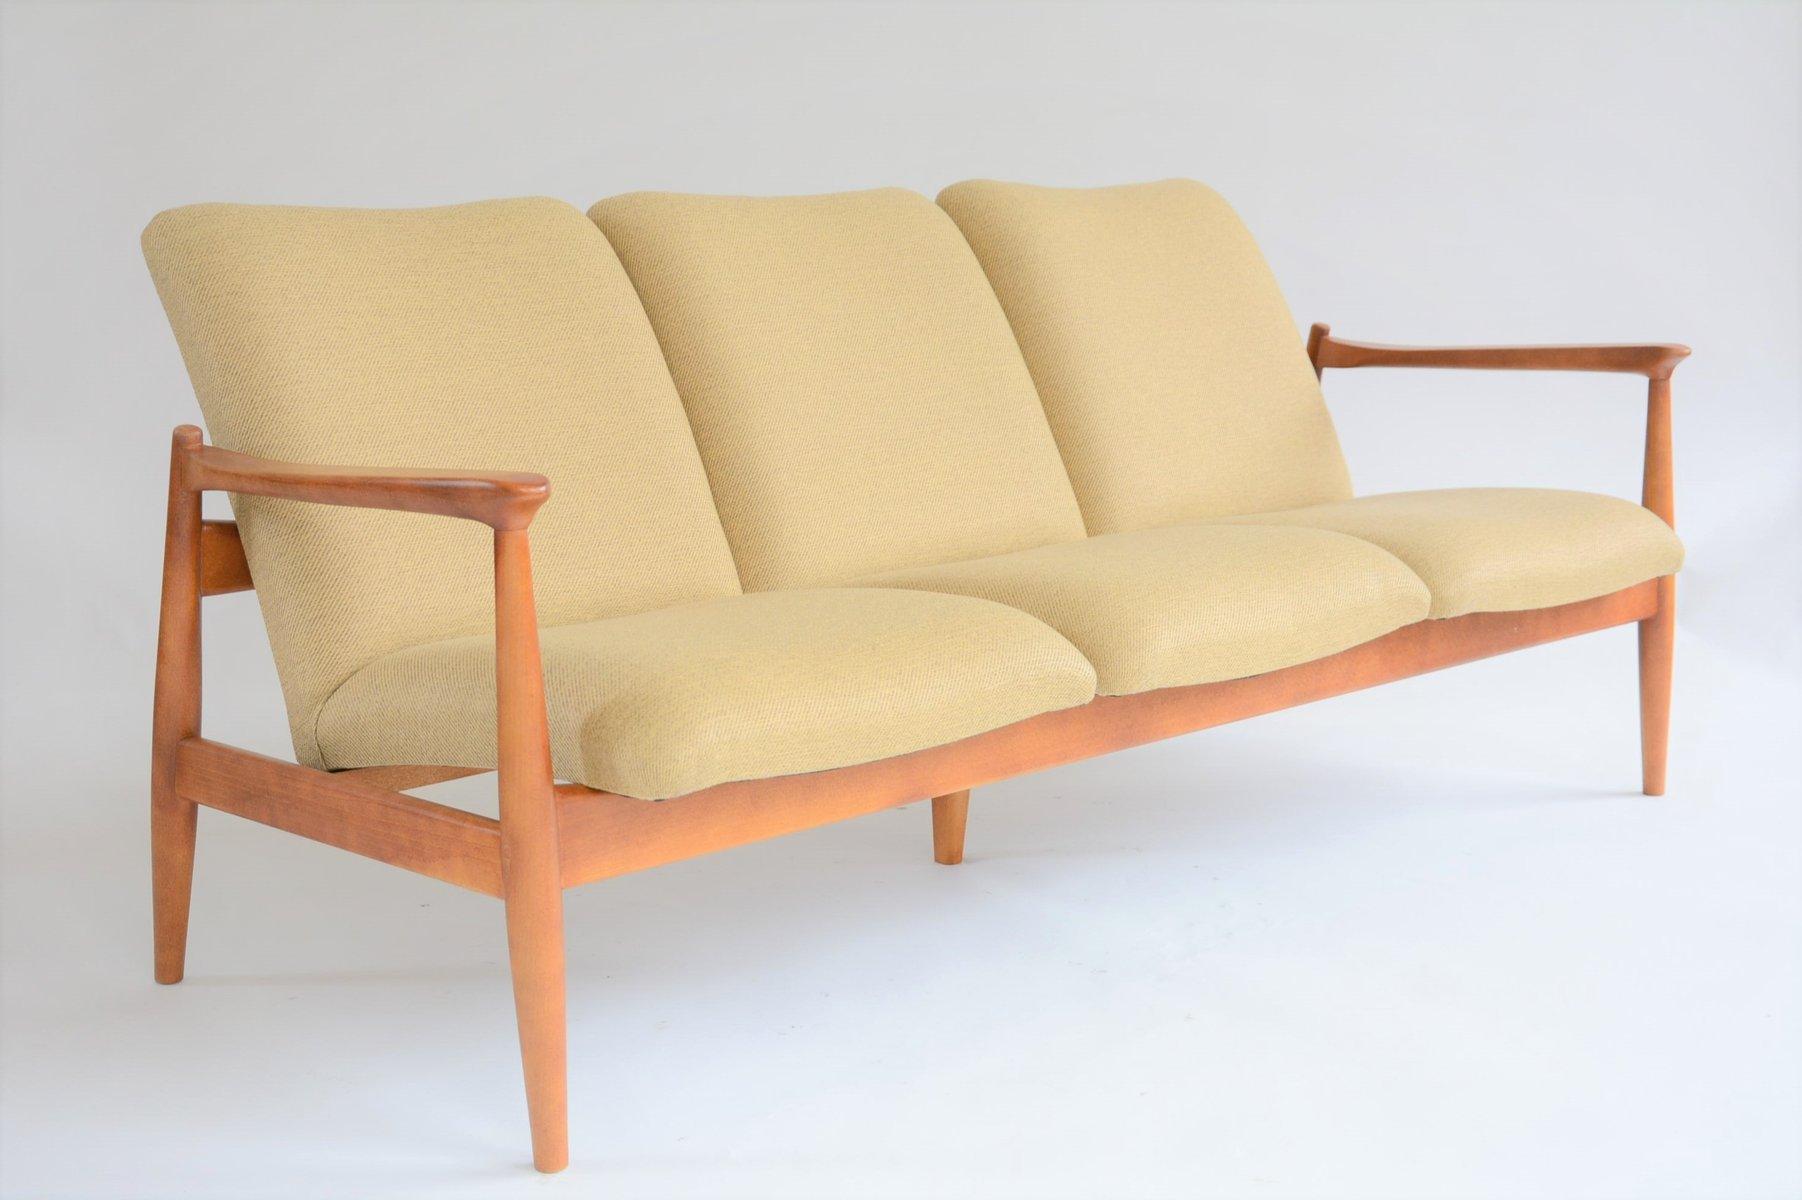 Gelbes Vintage 3-Sitzer Sofa, 1970er